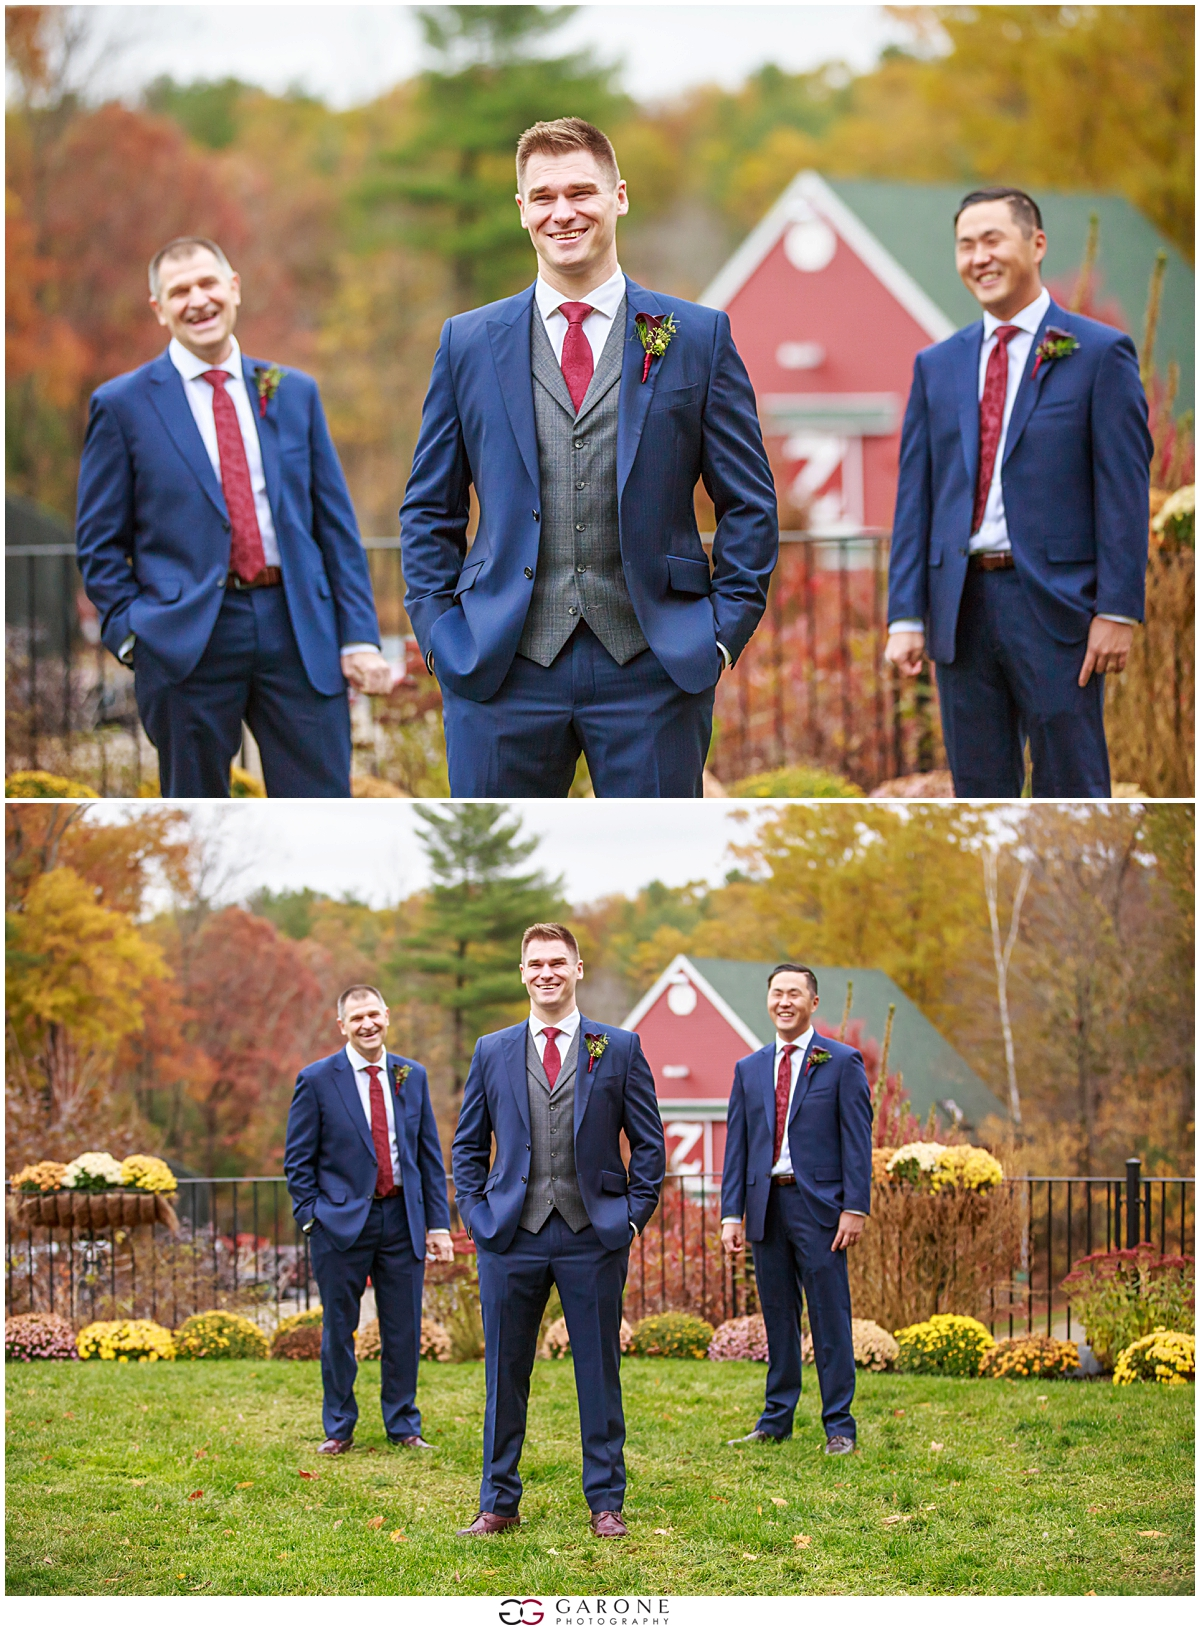 Rachel_Josh_Zorvinos_Wedding_NH_Wedding_Photography_Garone_Photography_Fall_Foliage_Wedding_0004.jpg